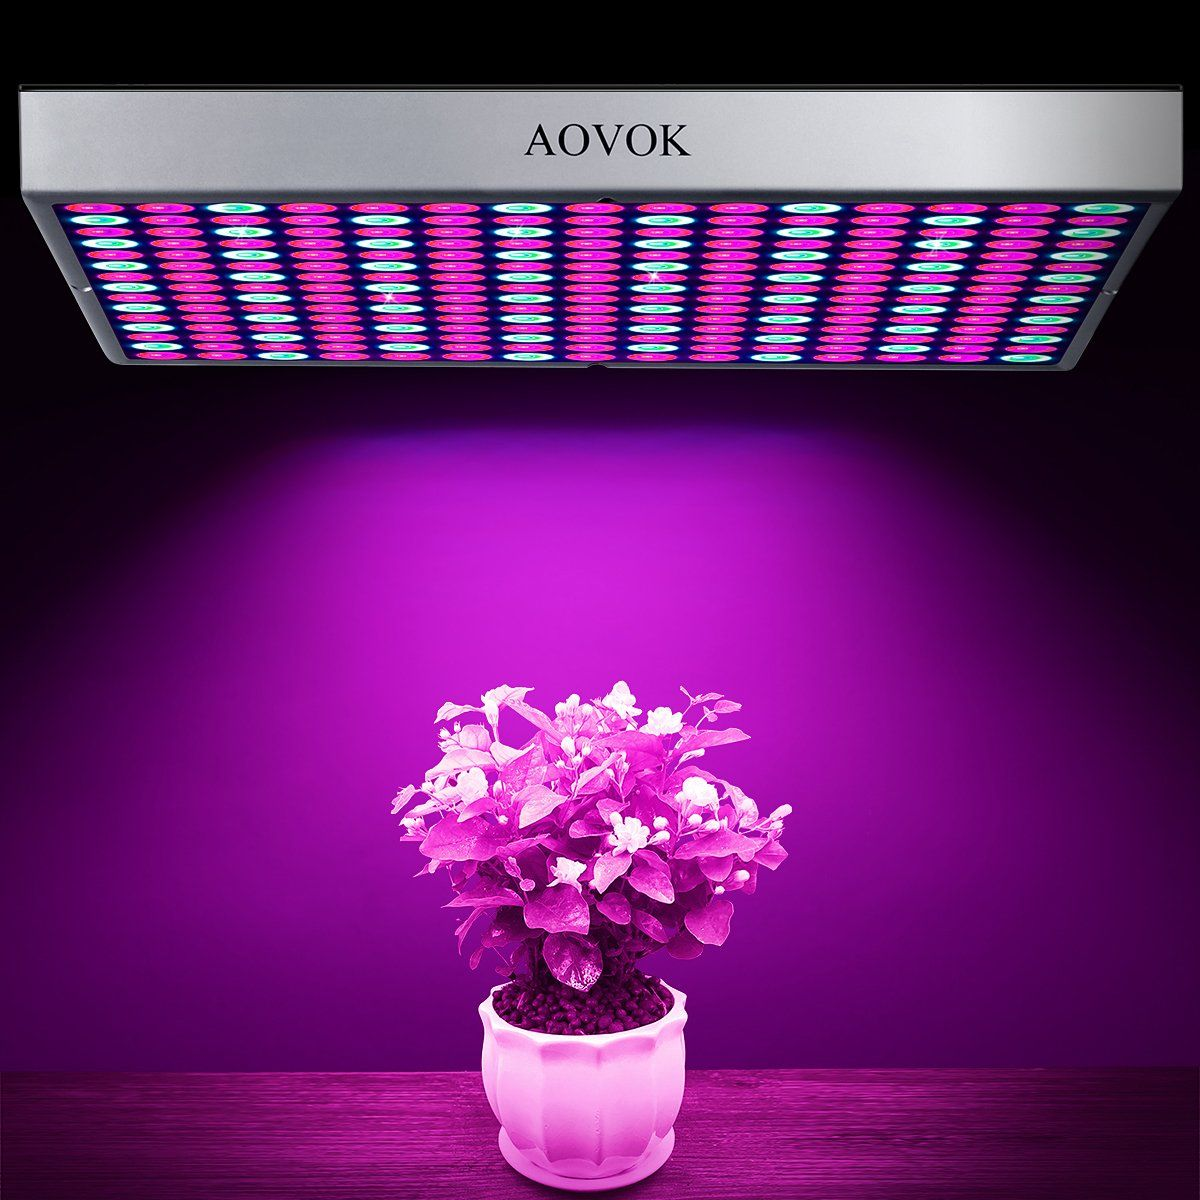 Led Grow Light For Indoor Plants Led Grow Light Bulbs Grow Light Bulbs Led Grow Lights